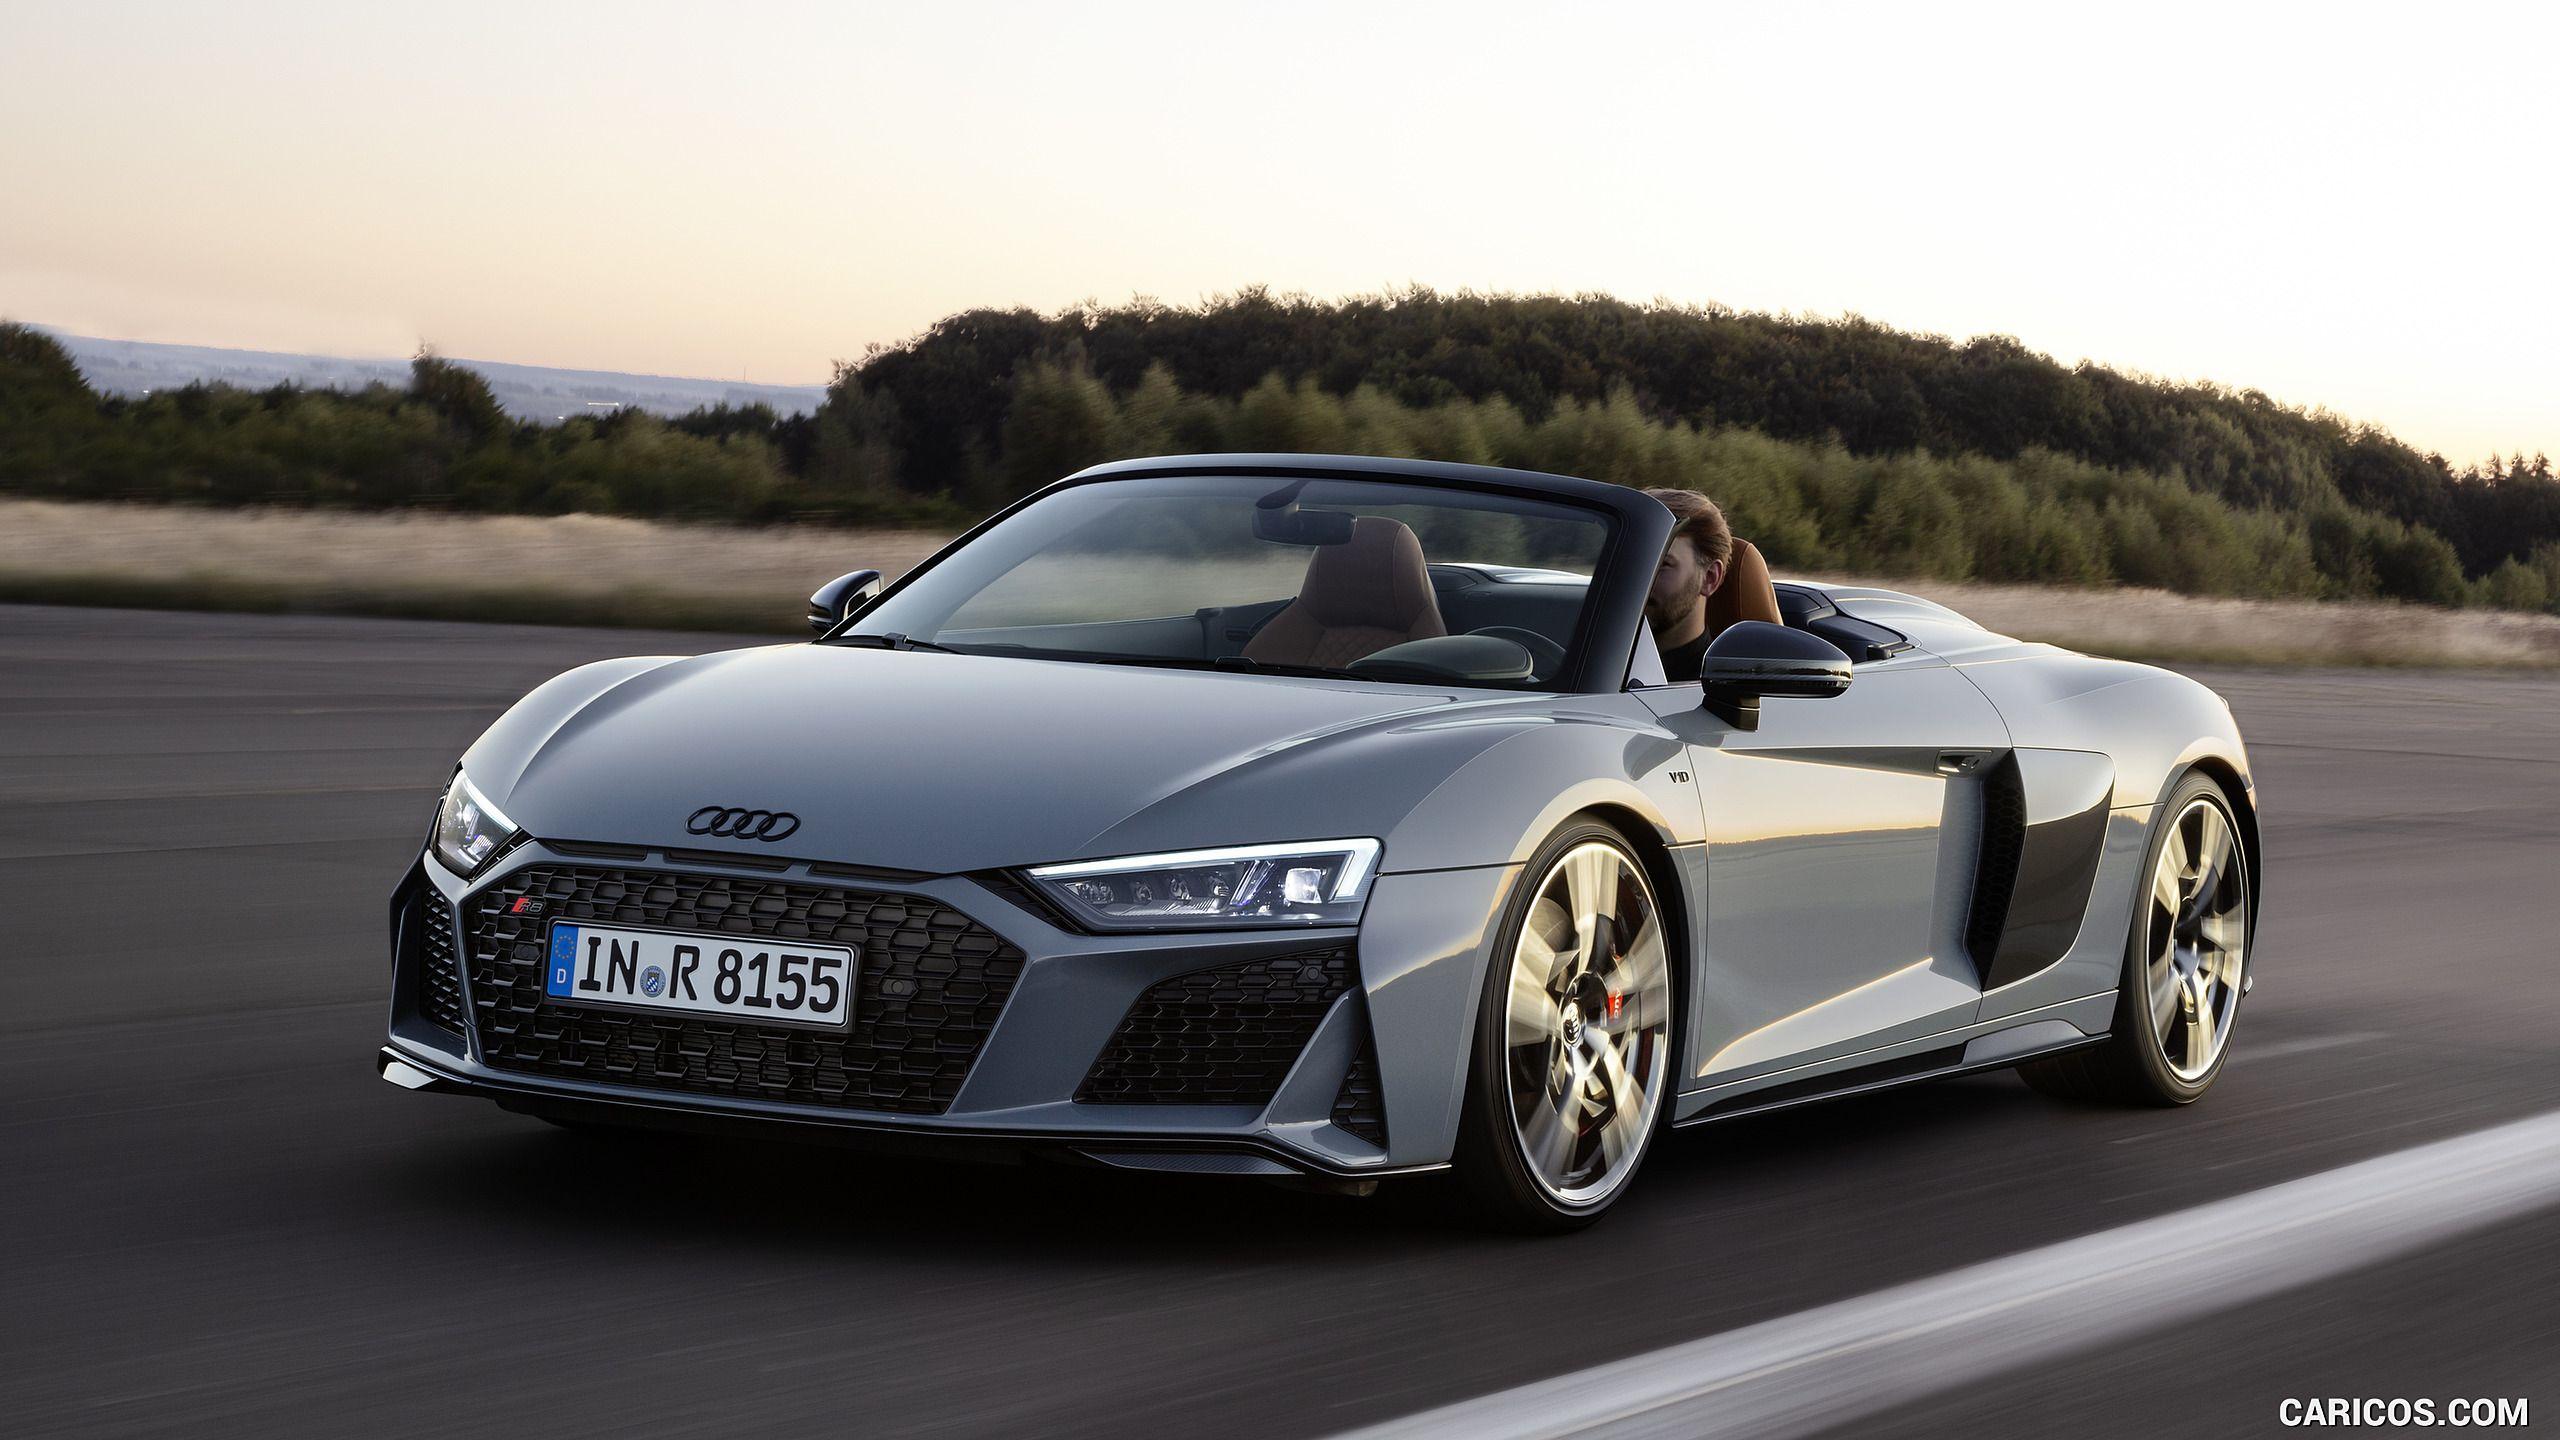 Next Stop Pinterest Best Convertible Cars Audi R8 Spyder Audi R8